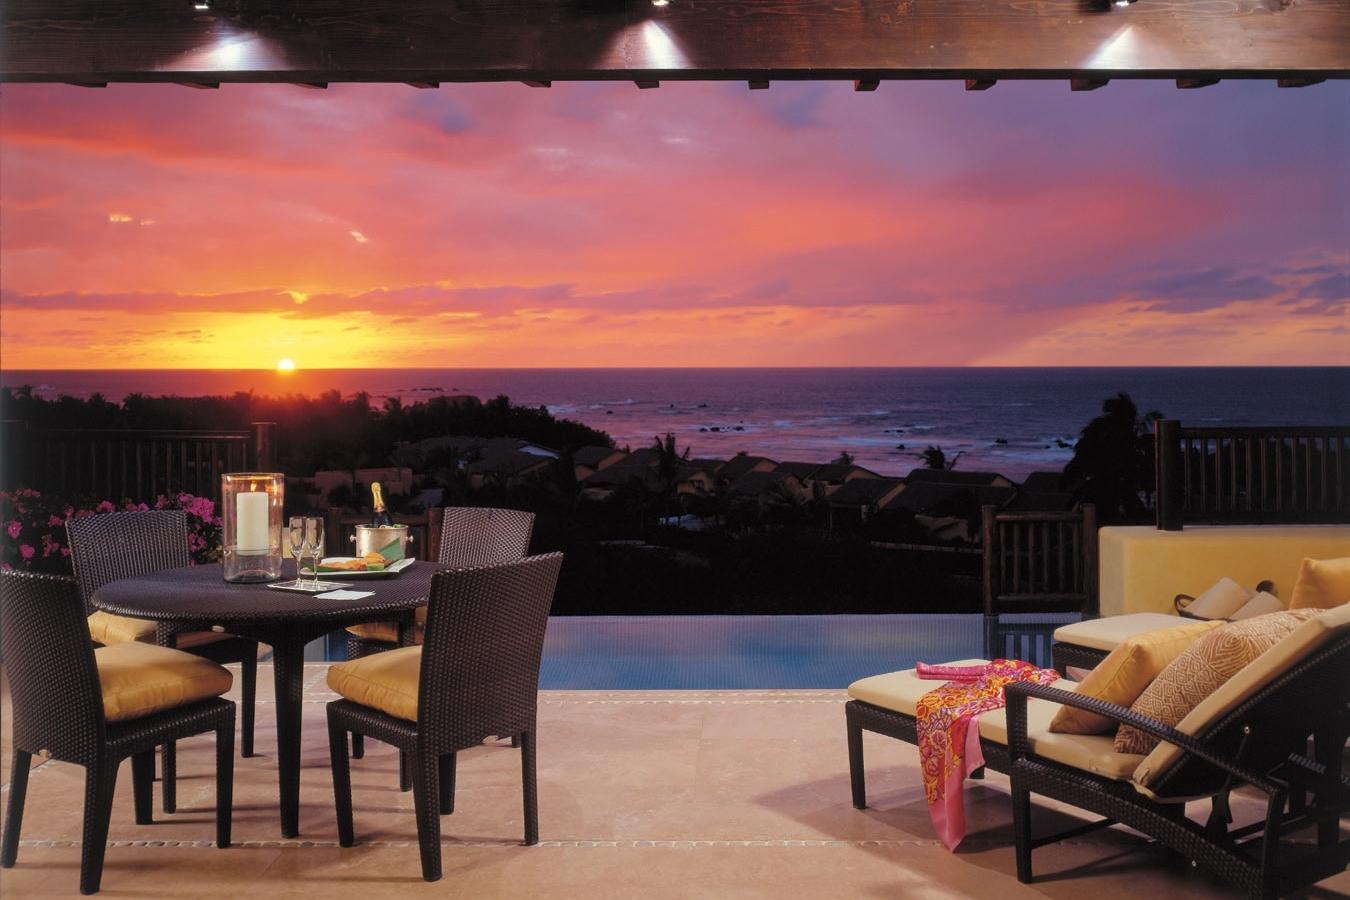 Four Seasons Punta Mita Terrace